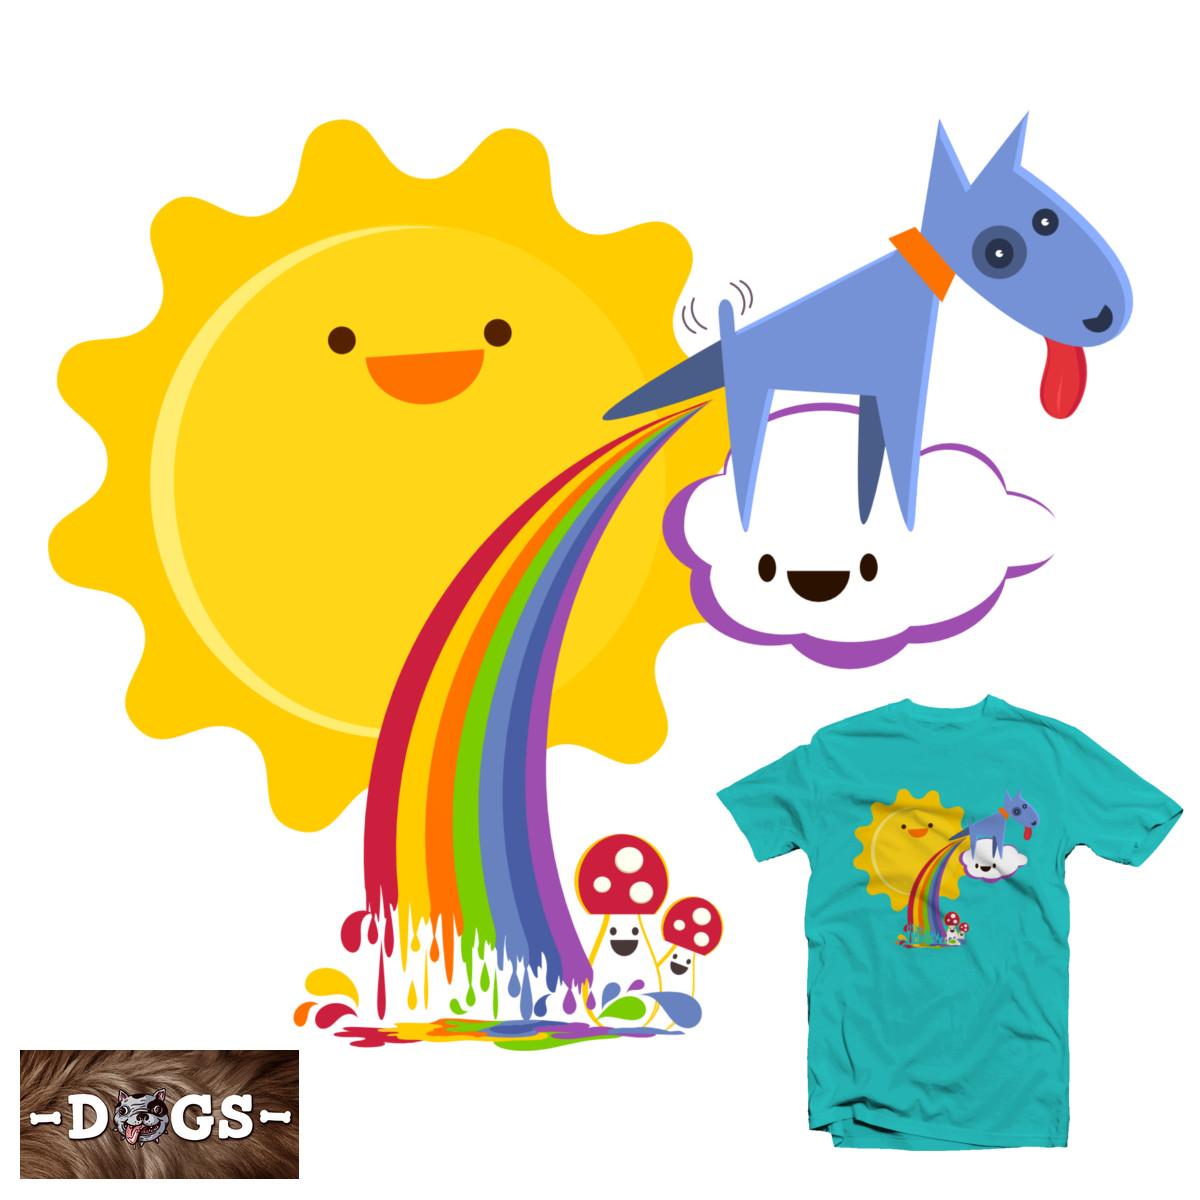 Rainbow Fred by hilektron on Threadless